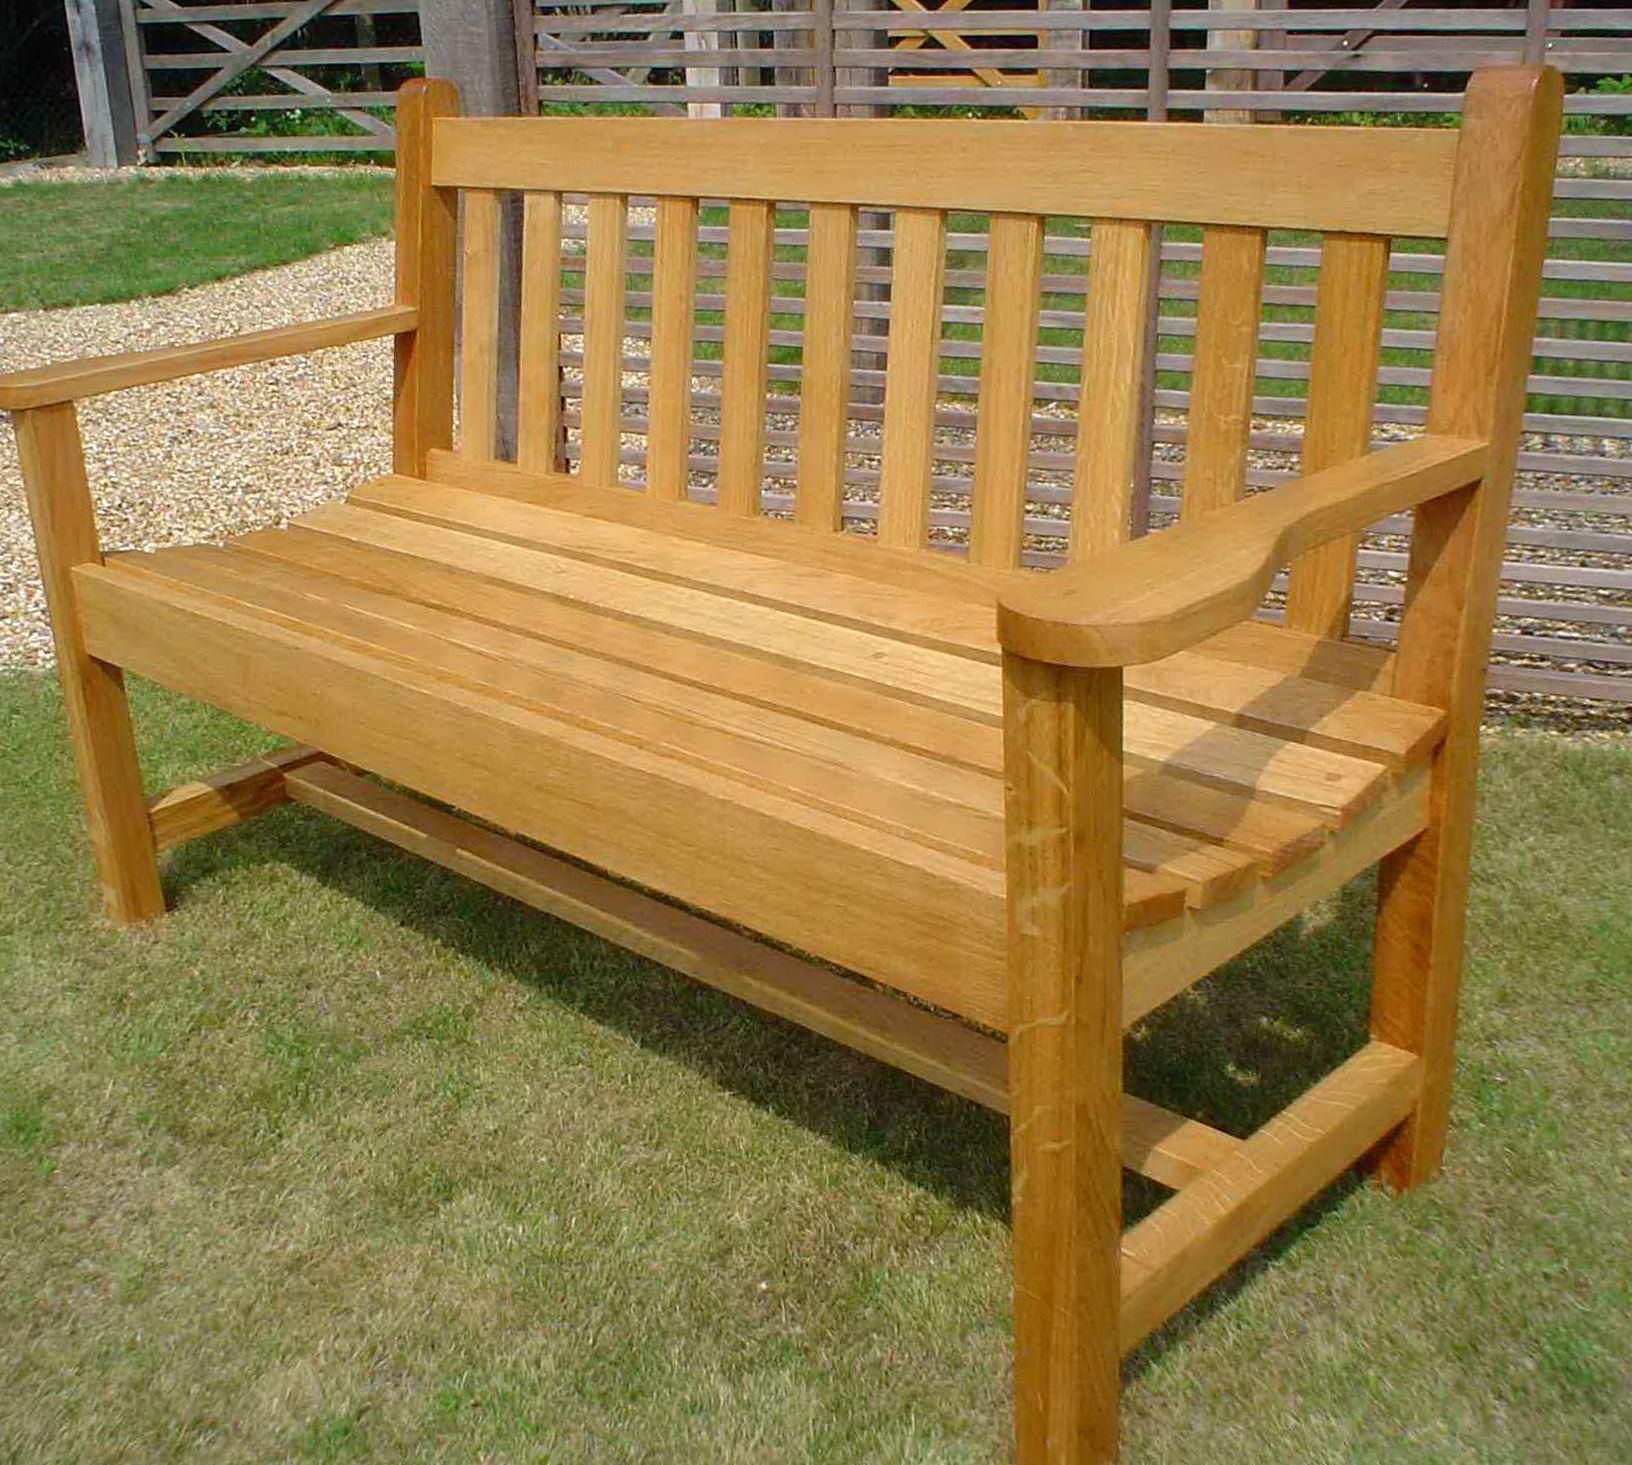 Free photo: Wooden garden bench - Planting, Pot, Pots - Free ...